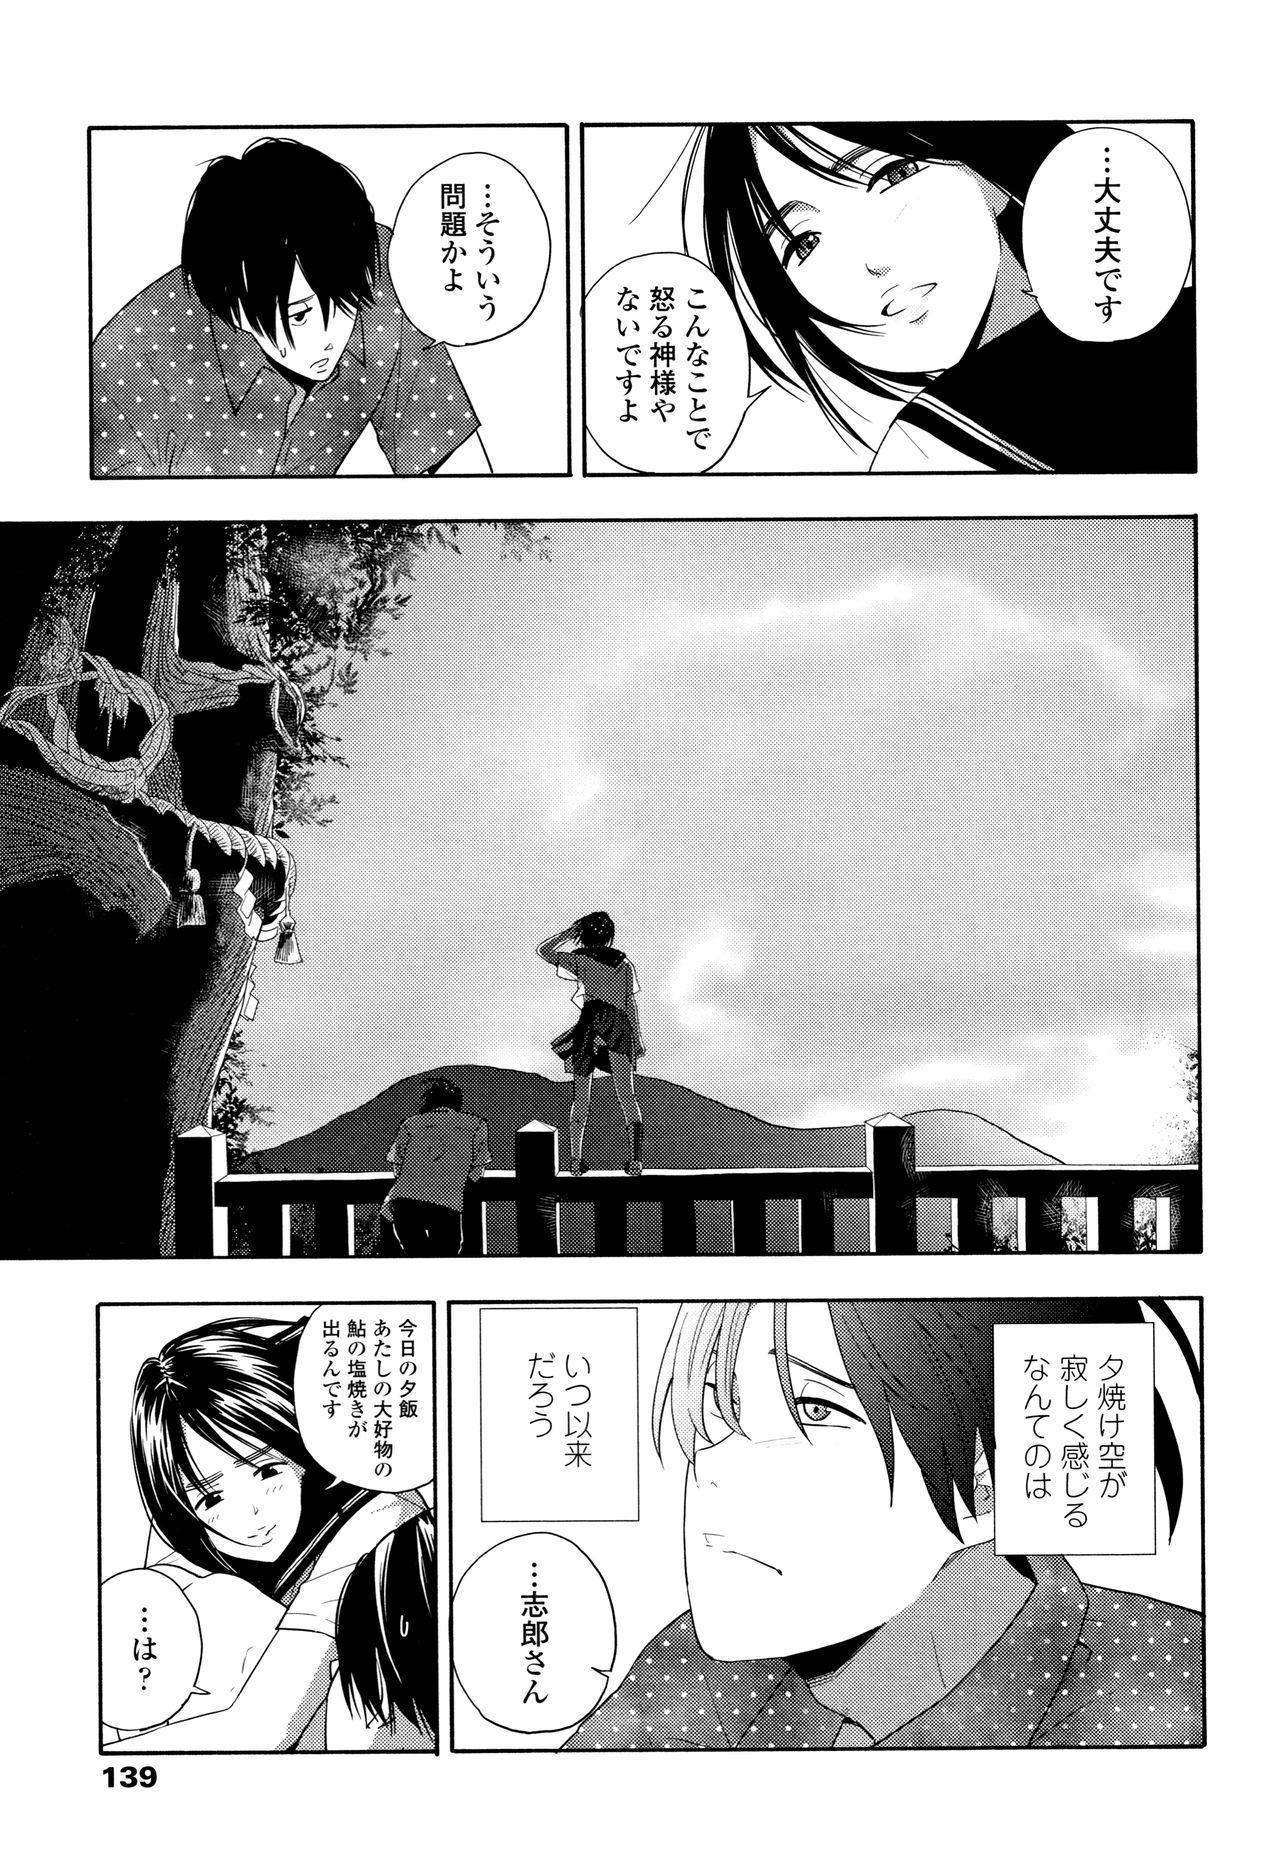 Shishunki no Eros - puberty eros 141